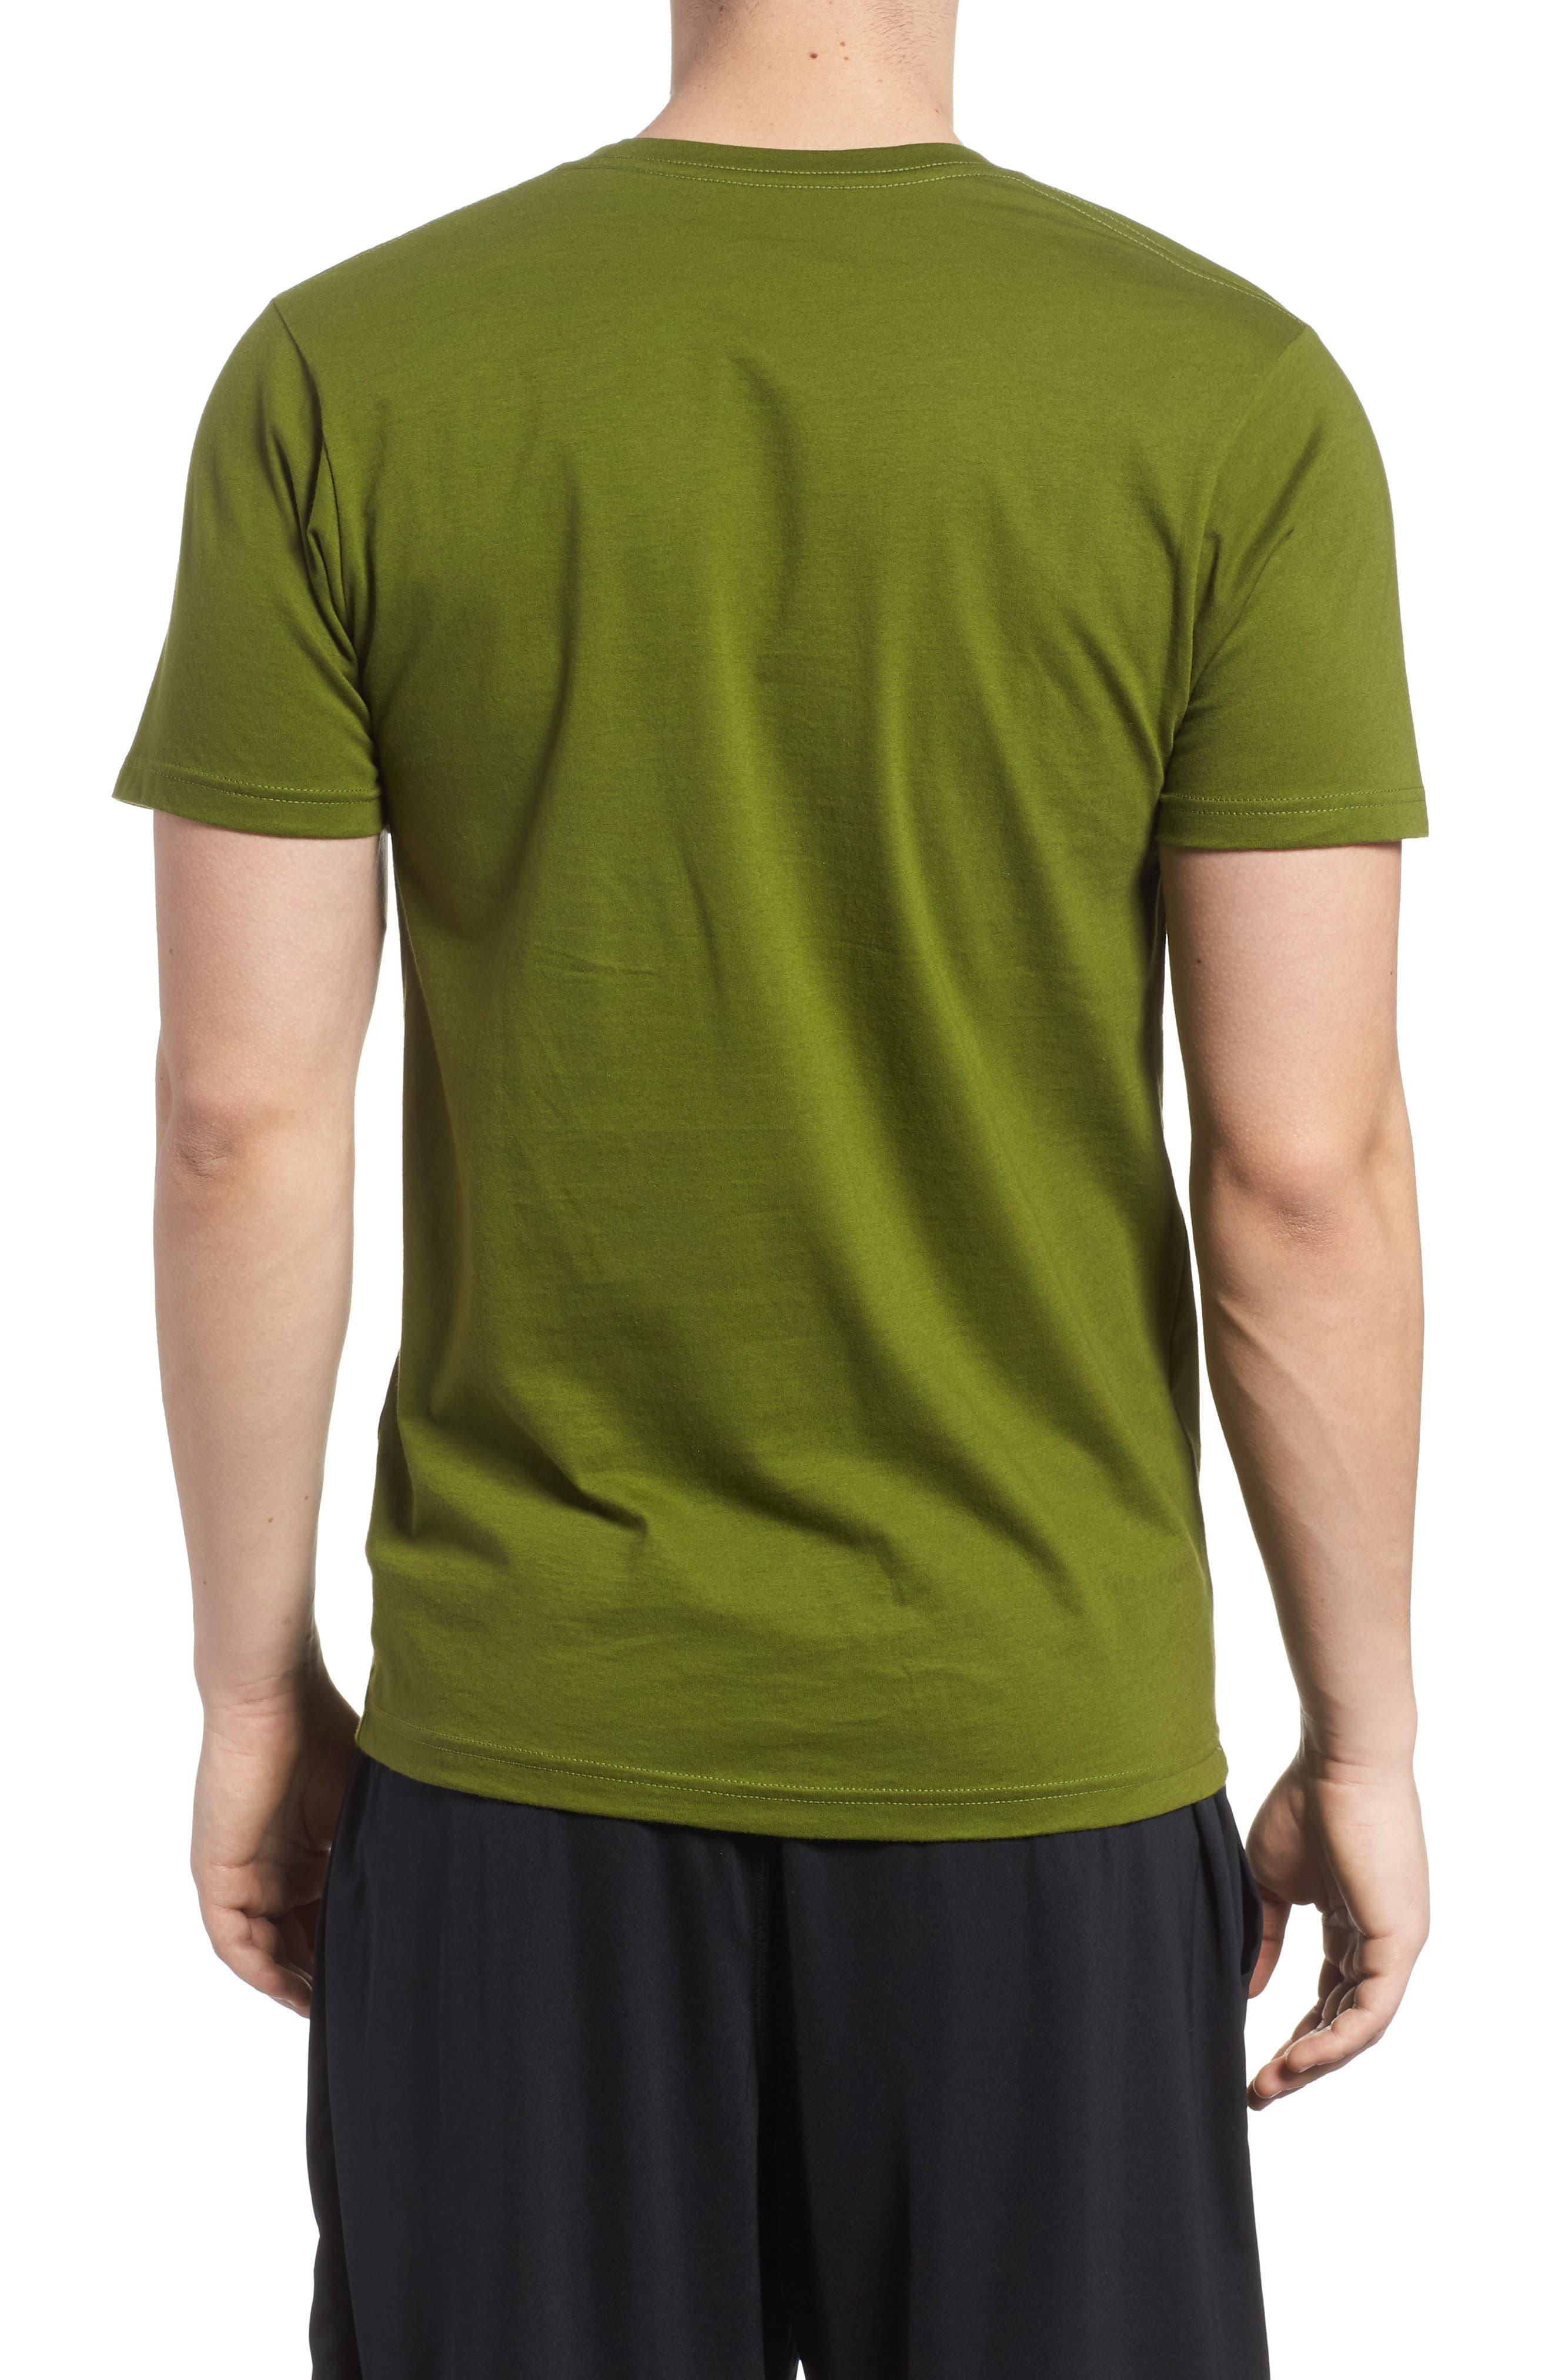 PATAGONIA,                             Oily Olas Slim Fit Organic Cotton T-Shirt,                             Alternate thumbnail 2, color,                             300